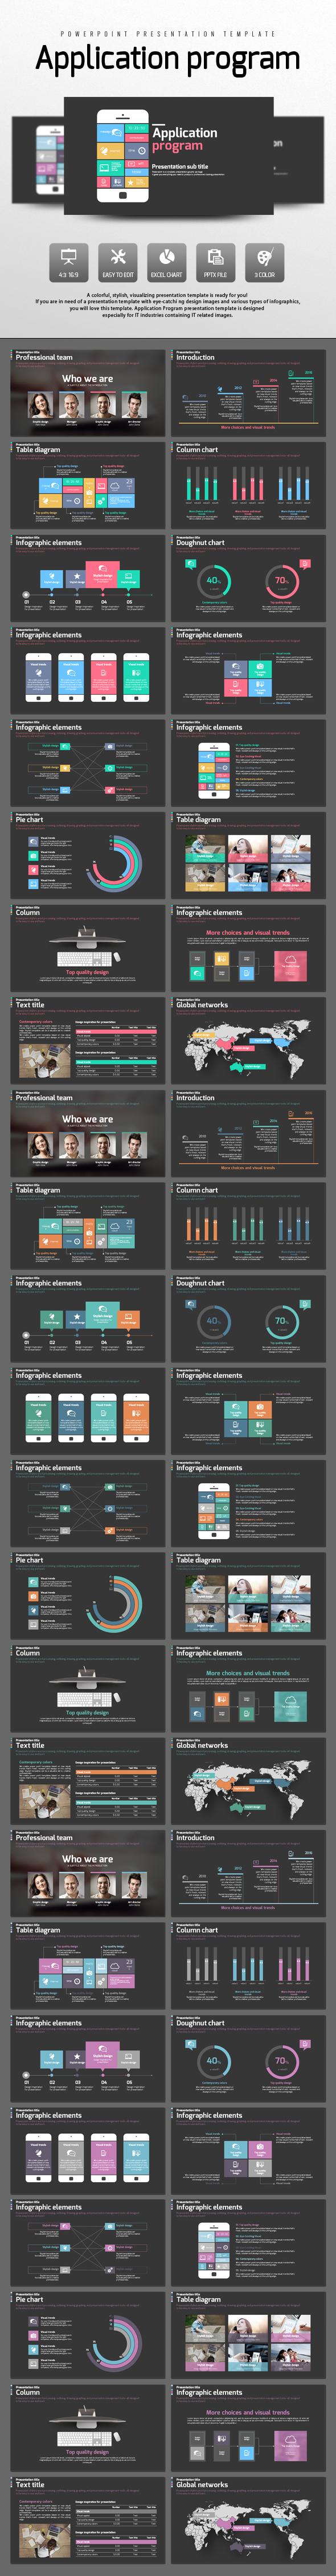 Application Program - PowerPoint Templates Presentation Templates